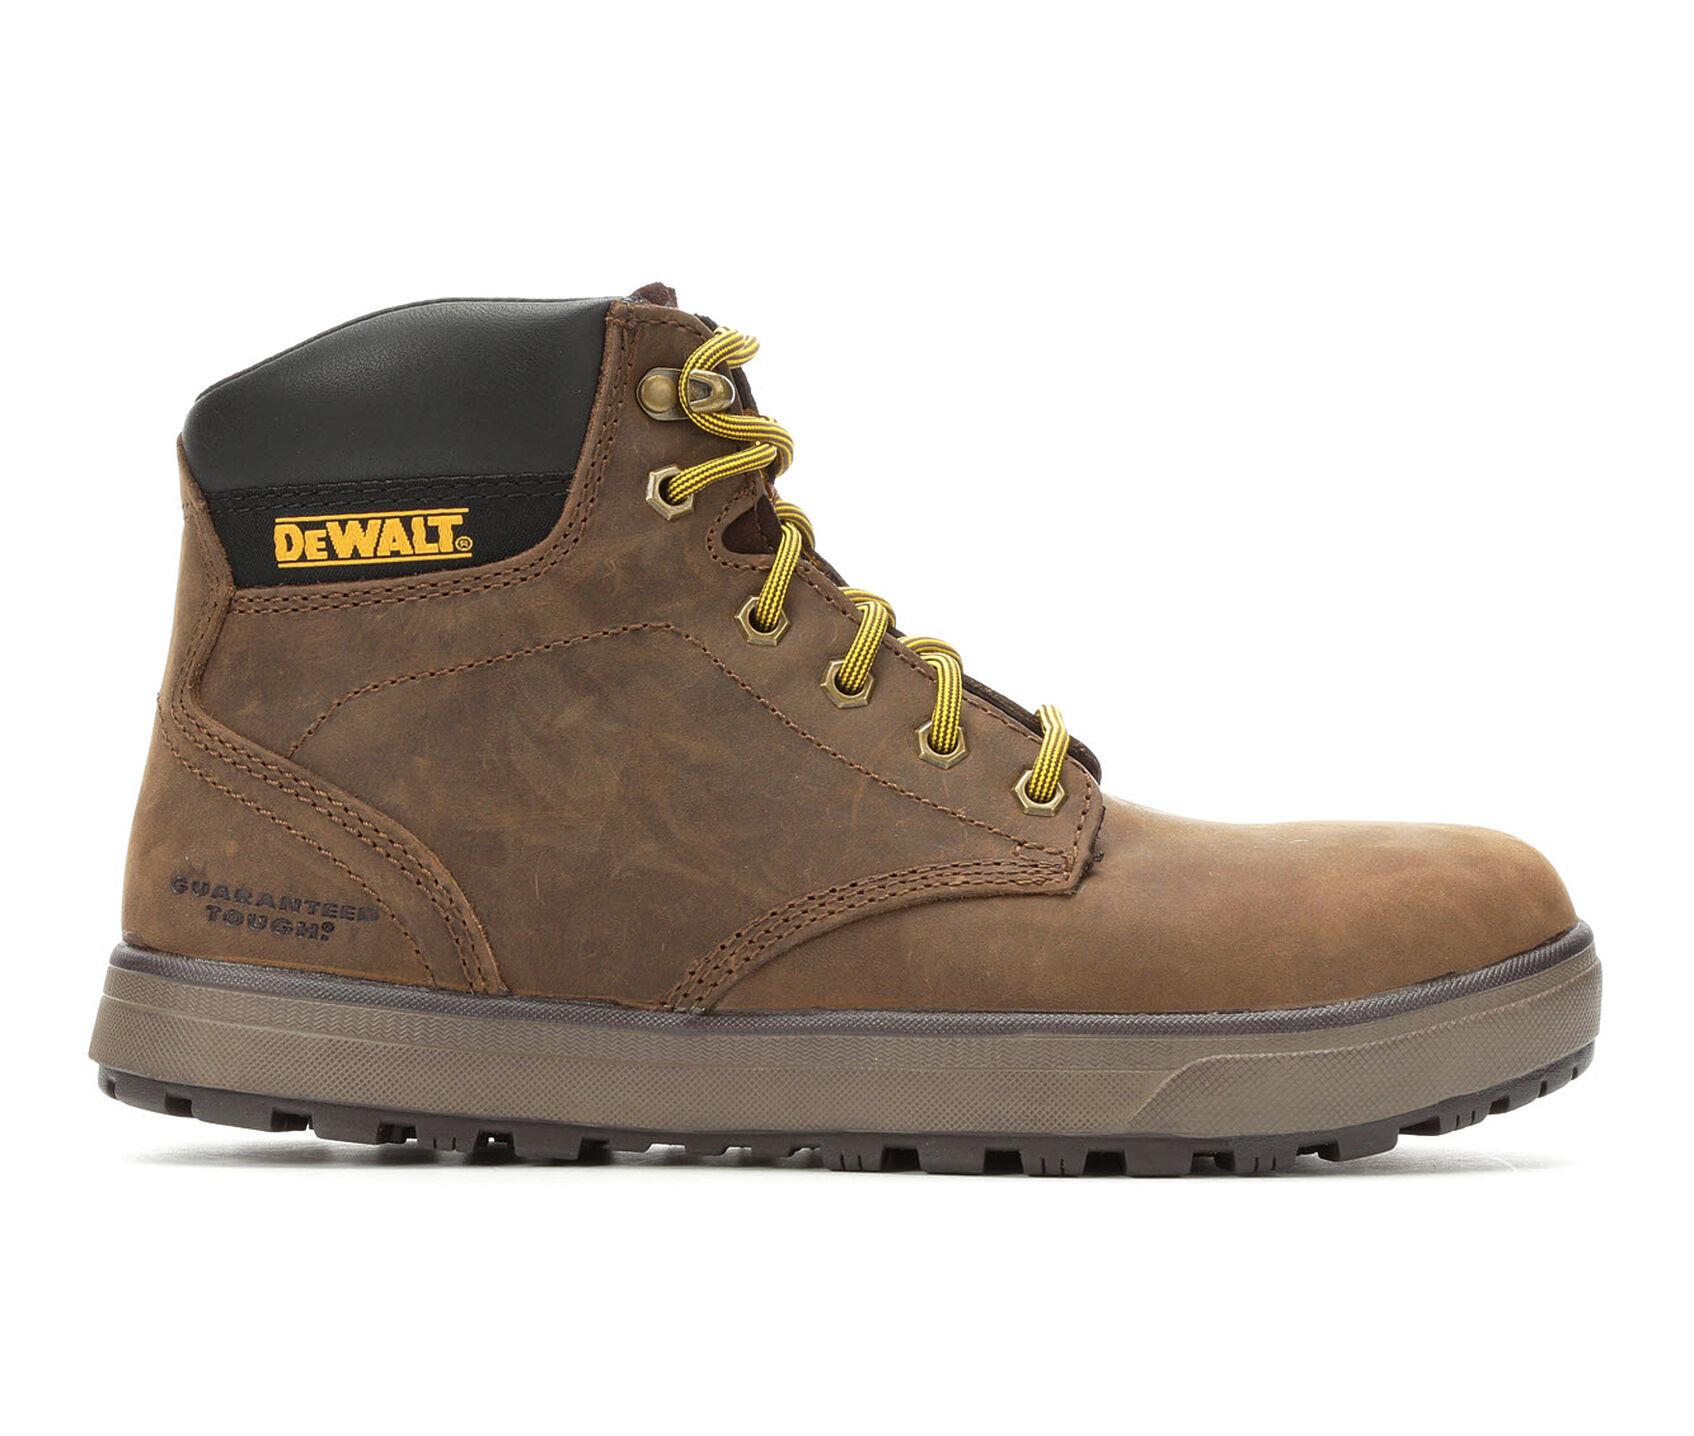 623c0ec5db5 Men's DeWALT Plasma 6 Inch Steel Toe Work Boots